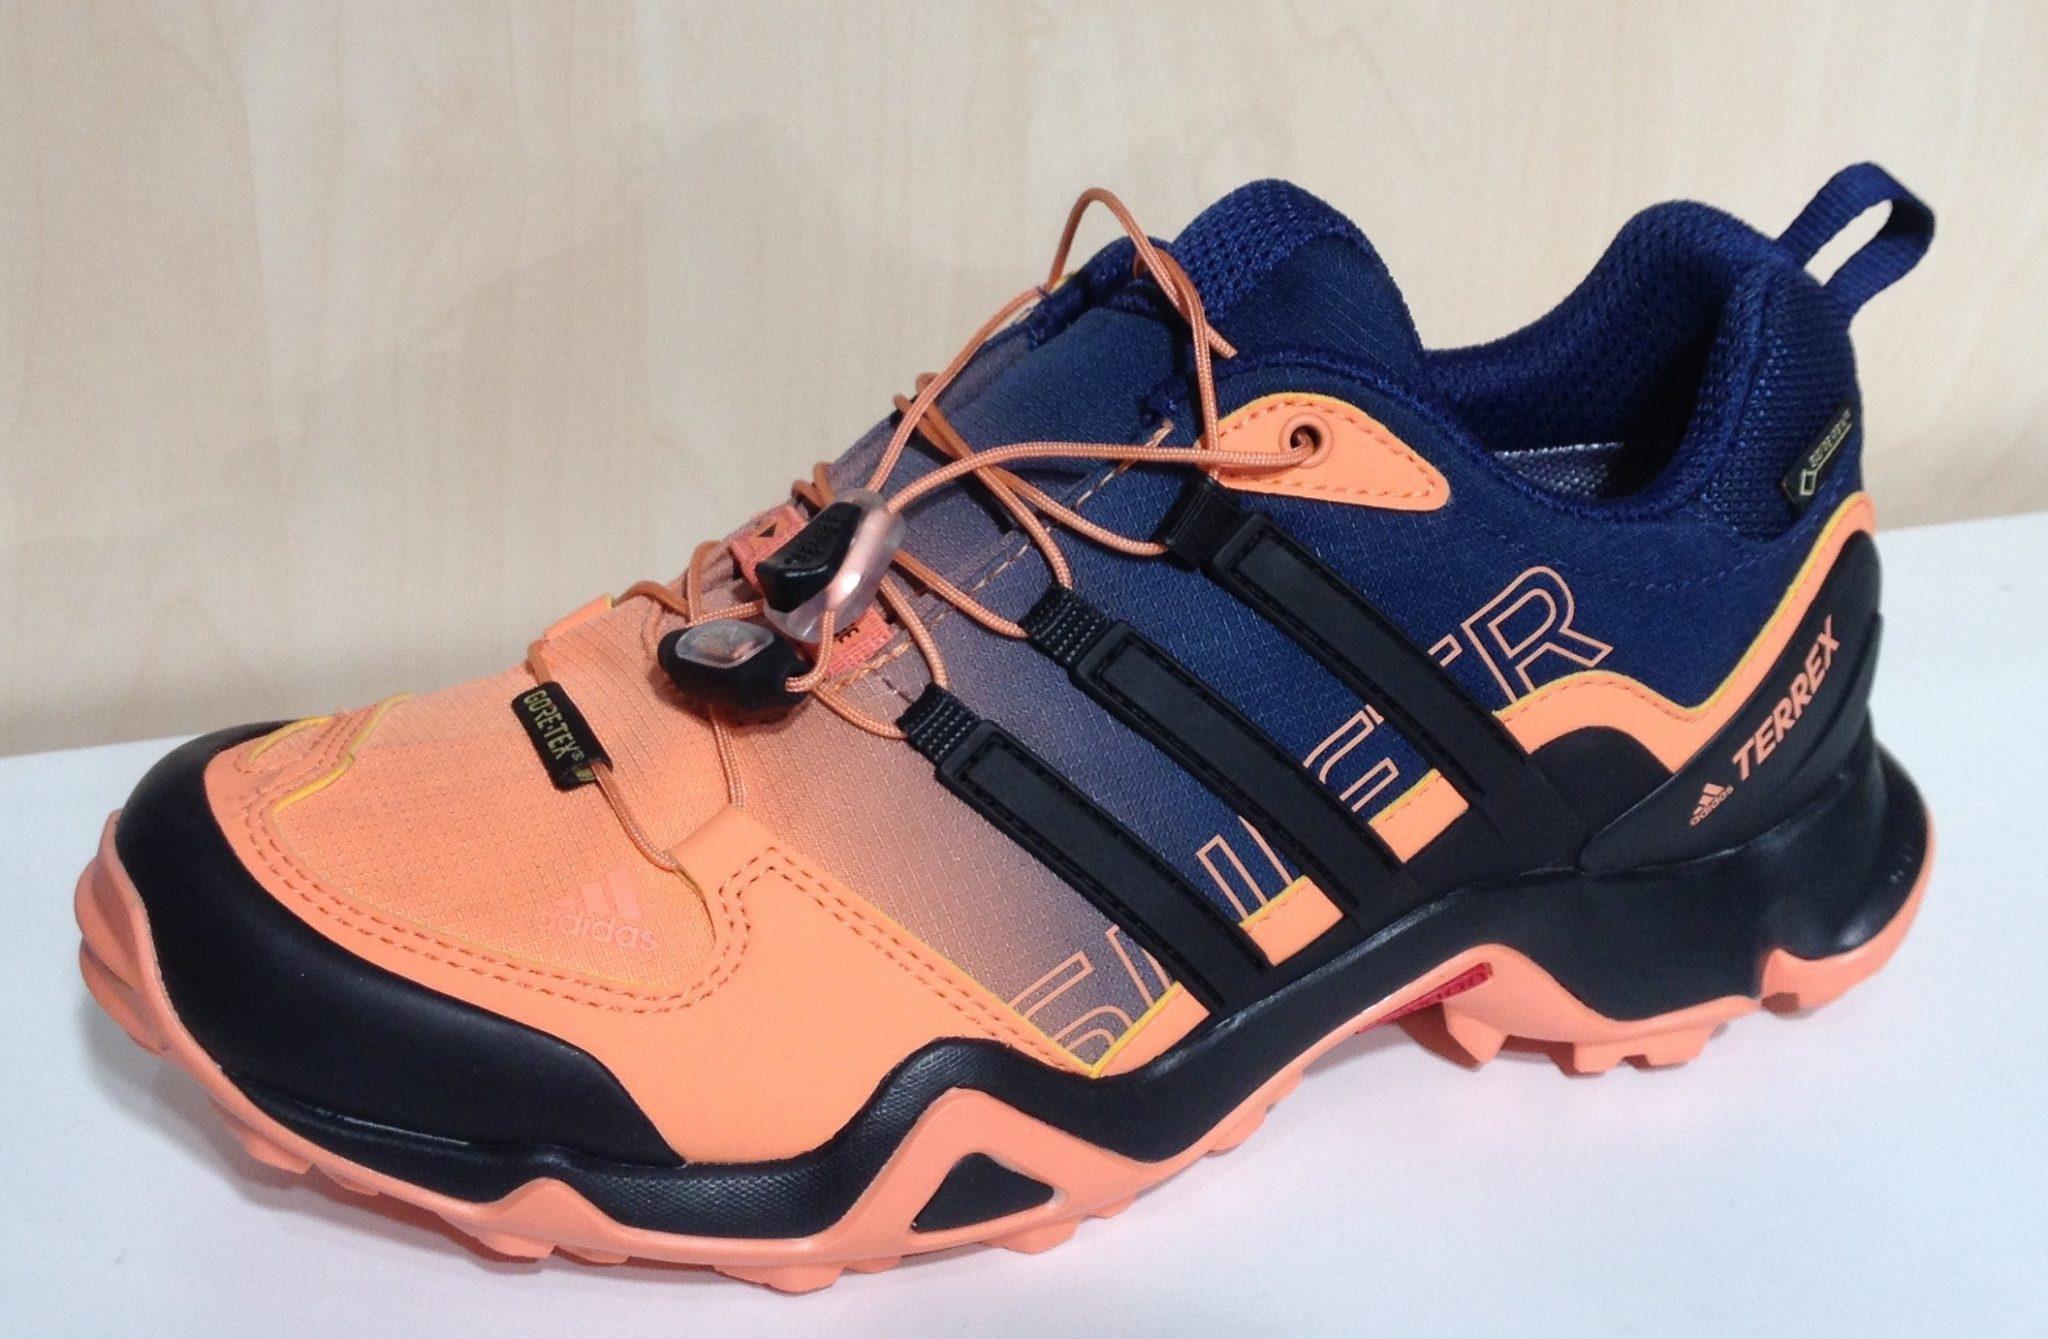 happy-women-mountain-sport-femme-plaisir-sport-randonnee-accessoires-equipement-chaussures-randonnee-montagne